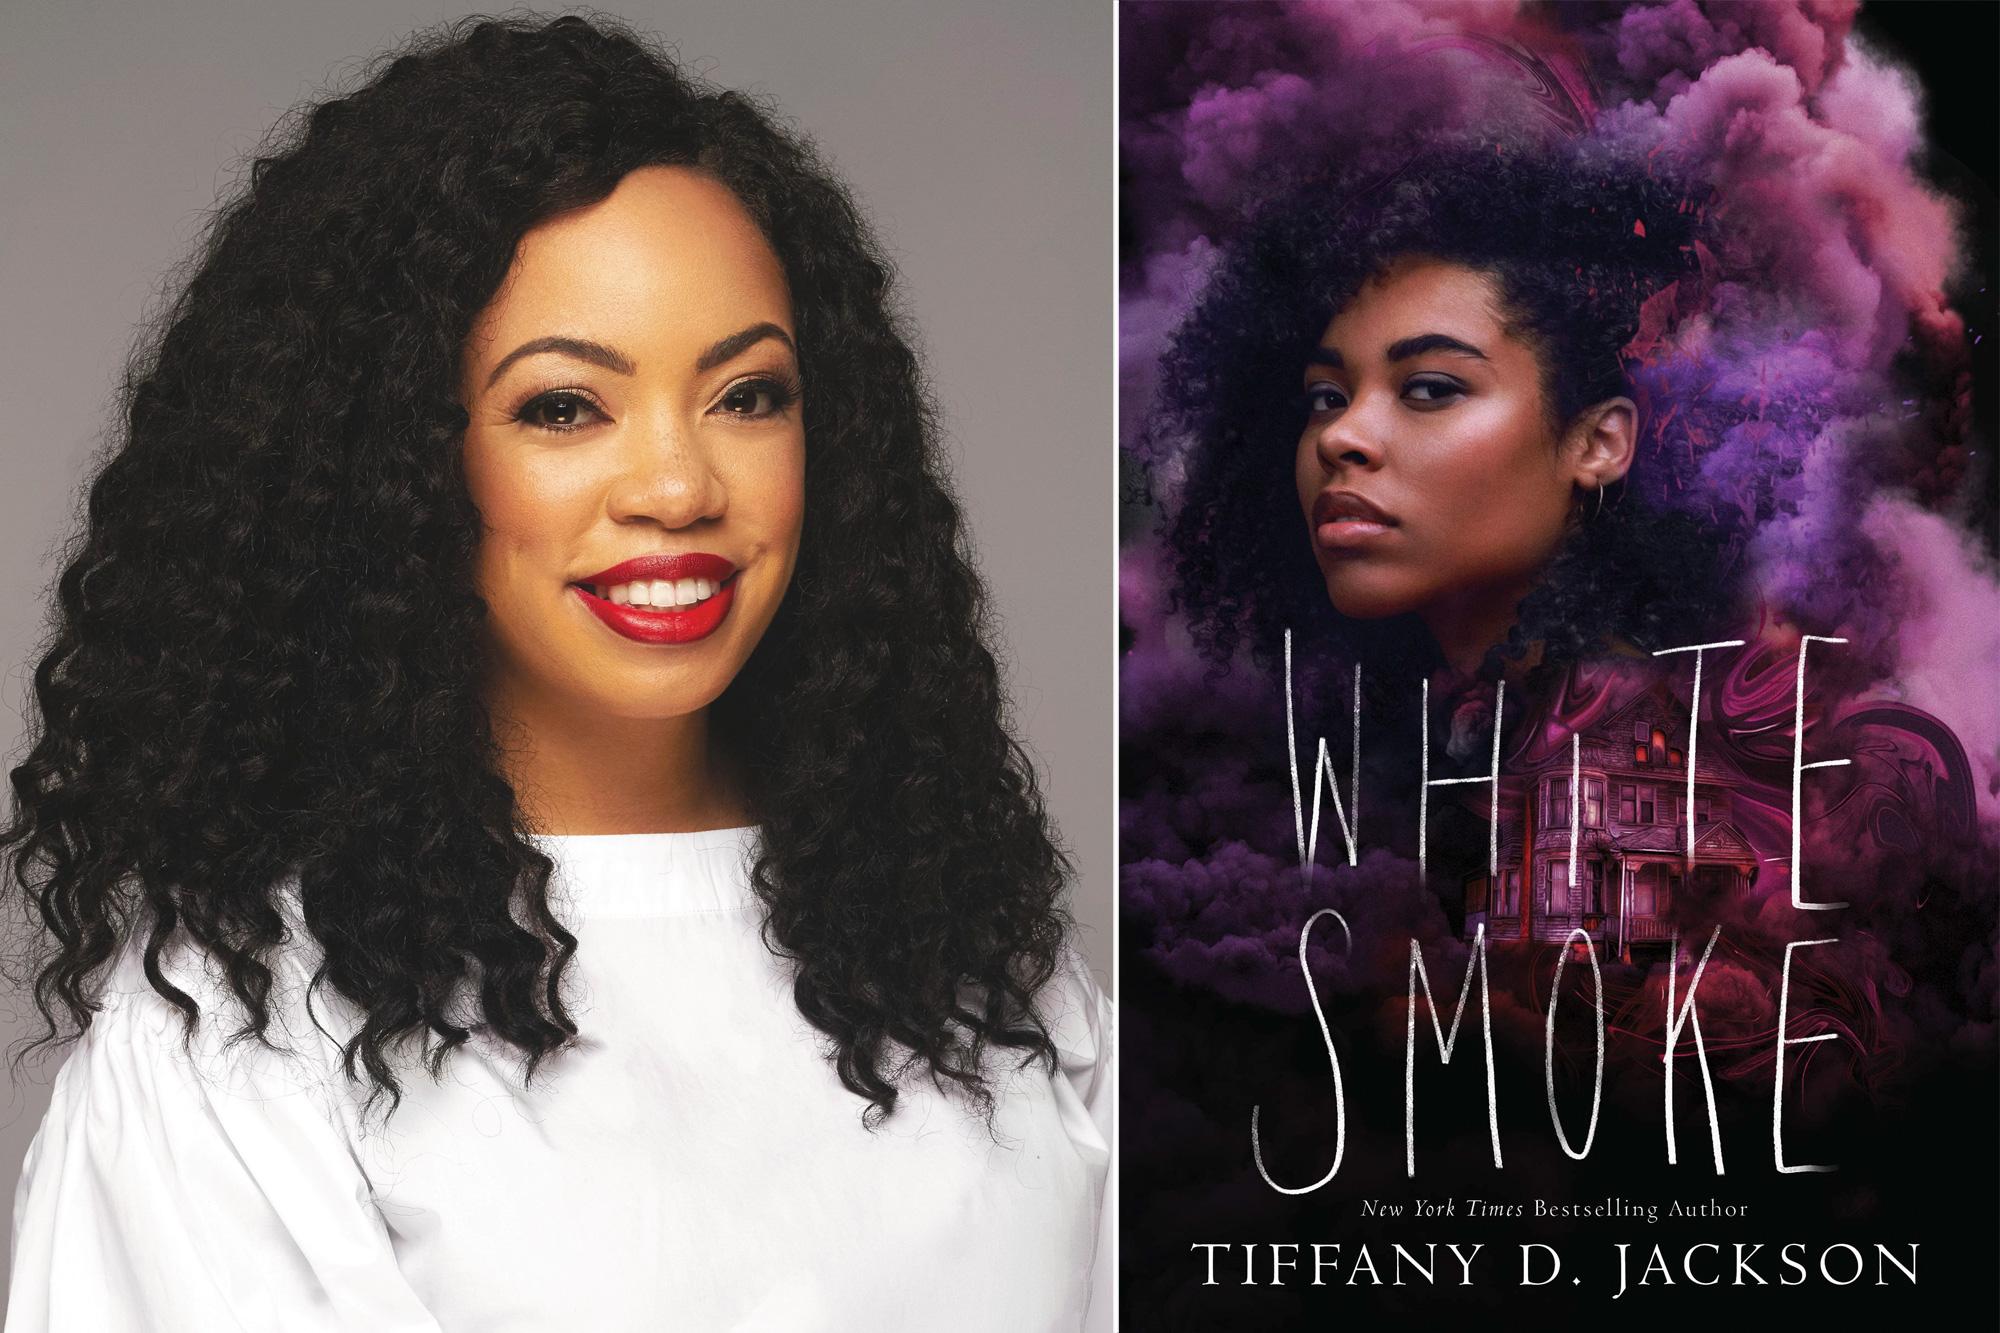 Tiffany D. Jackson, White Smoke